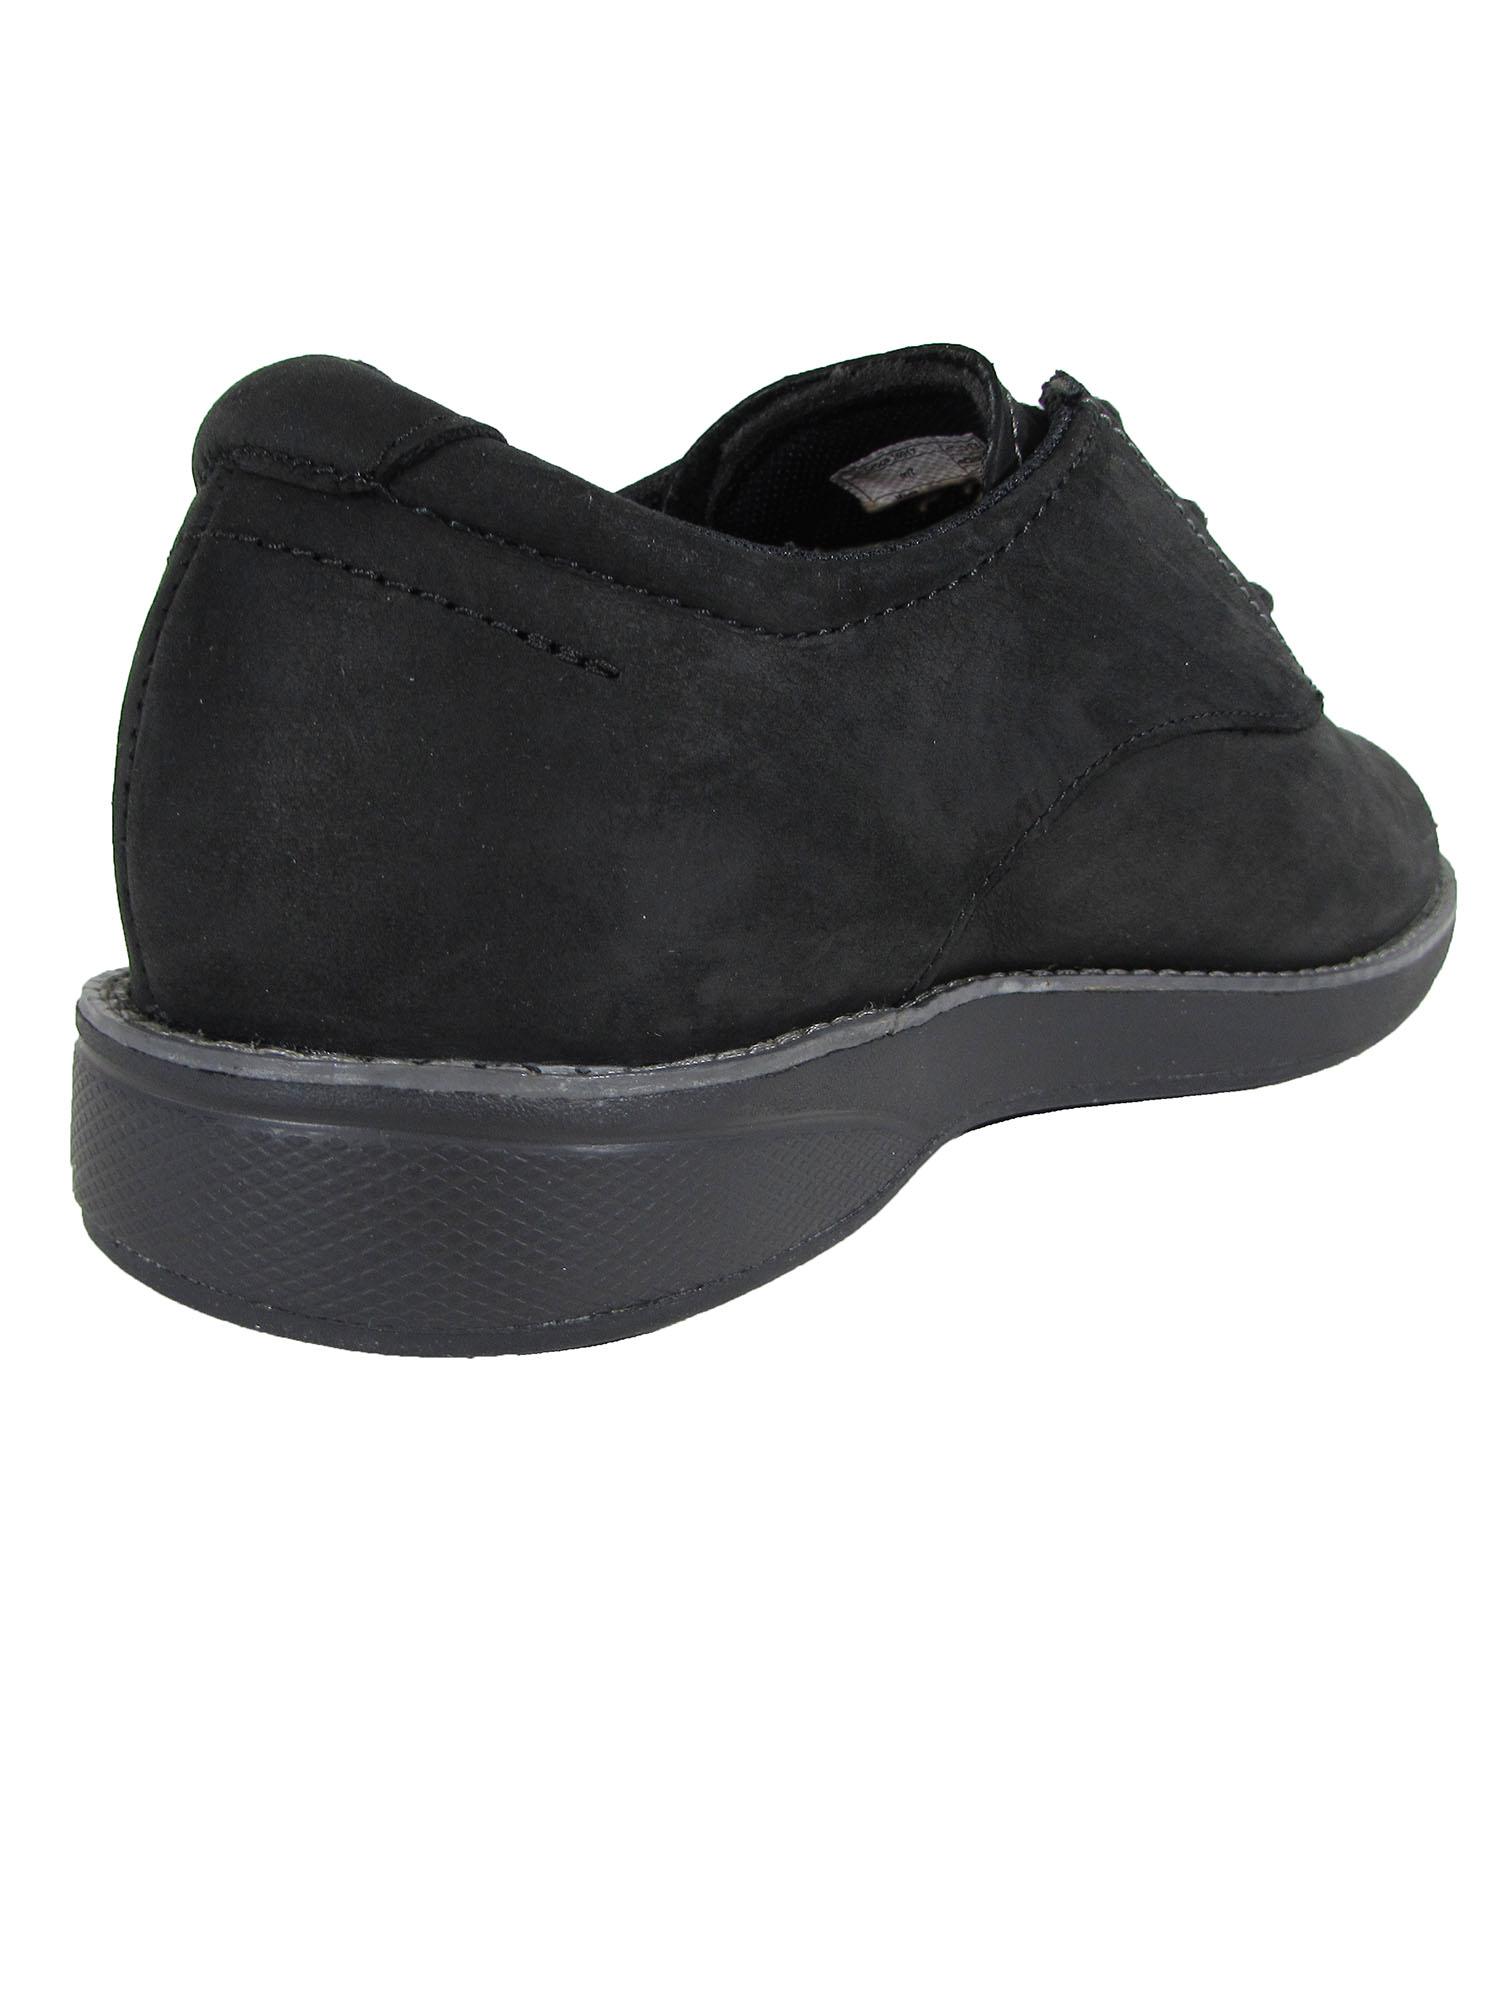 Crocs-Mens-Foray-Lace-Up-Oxford-Shoes thumbnail 4